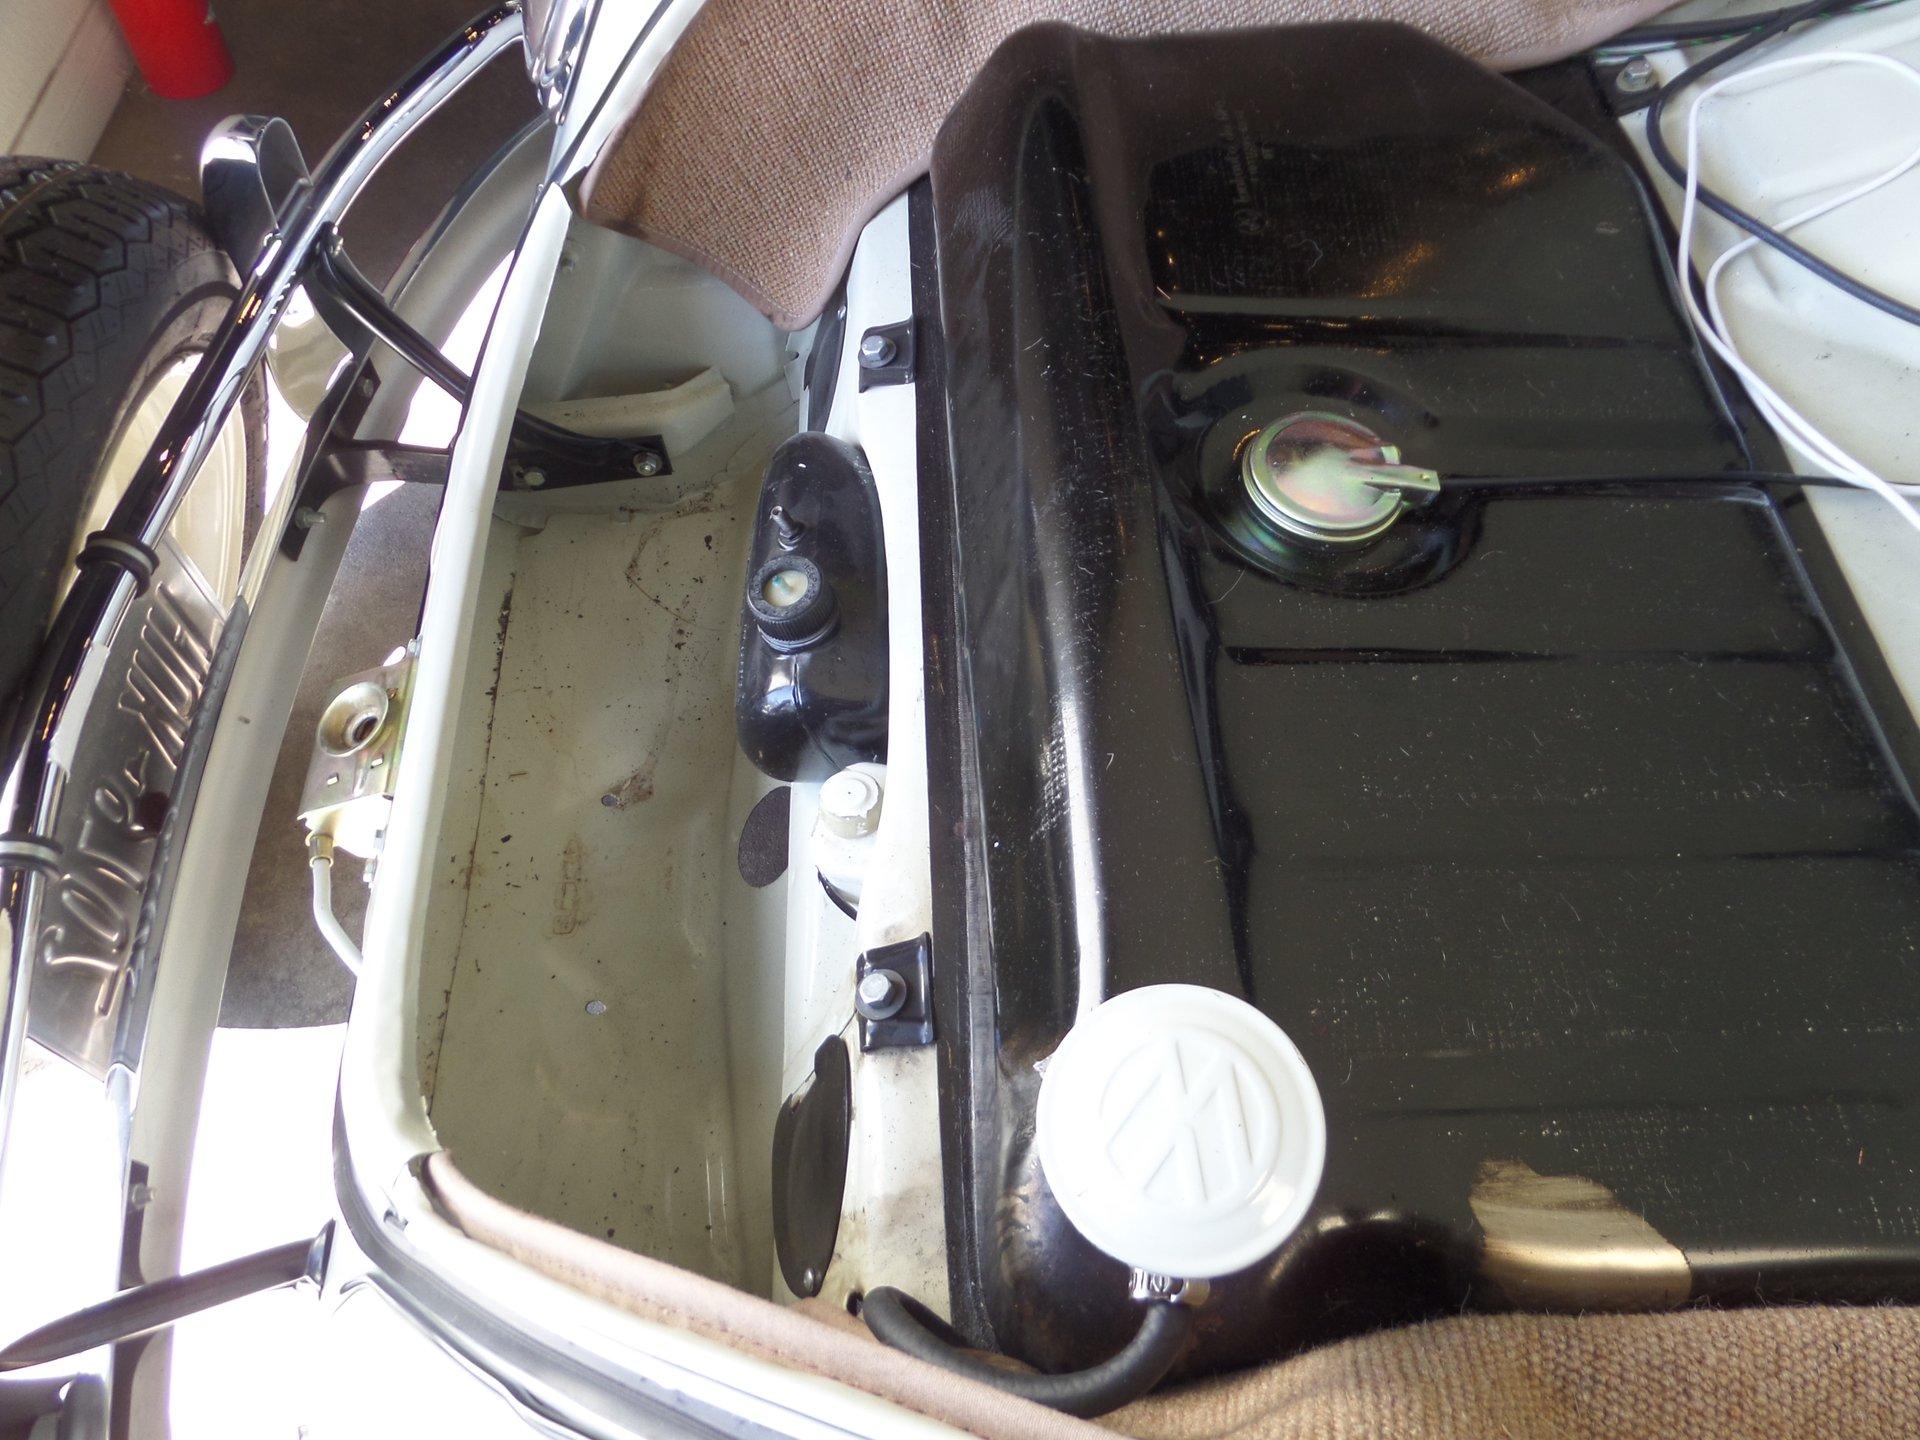 1964 Volkswagen Type 1 Beetle | Laguna Classic Cars & Automotive Art